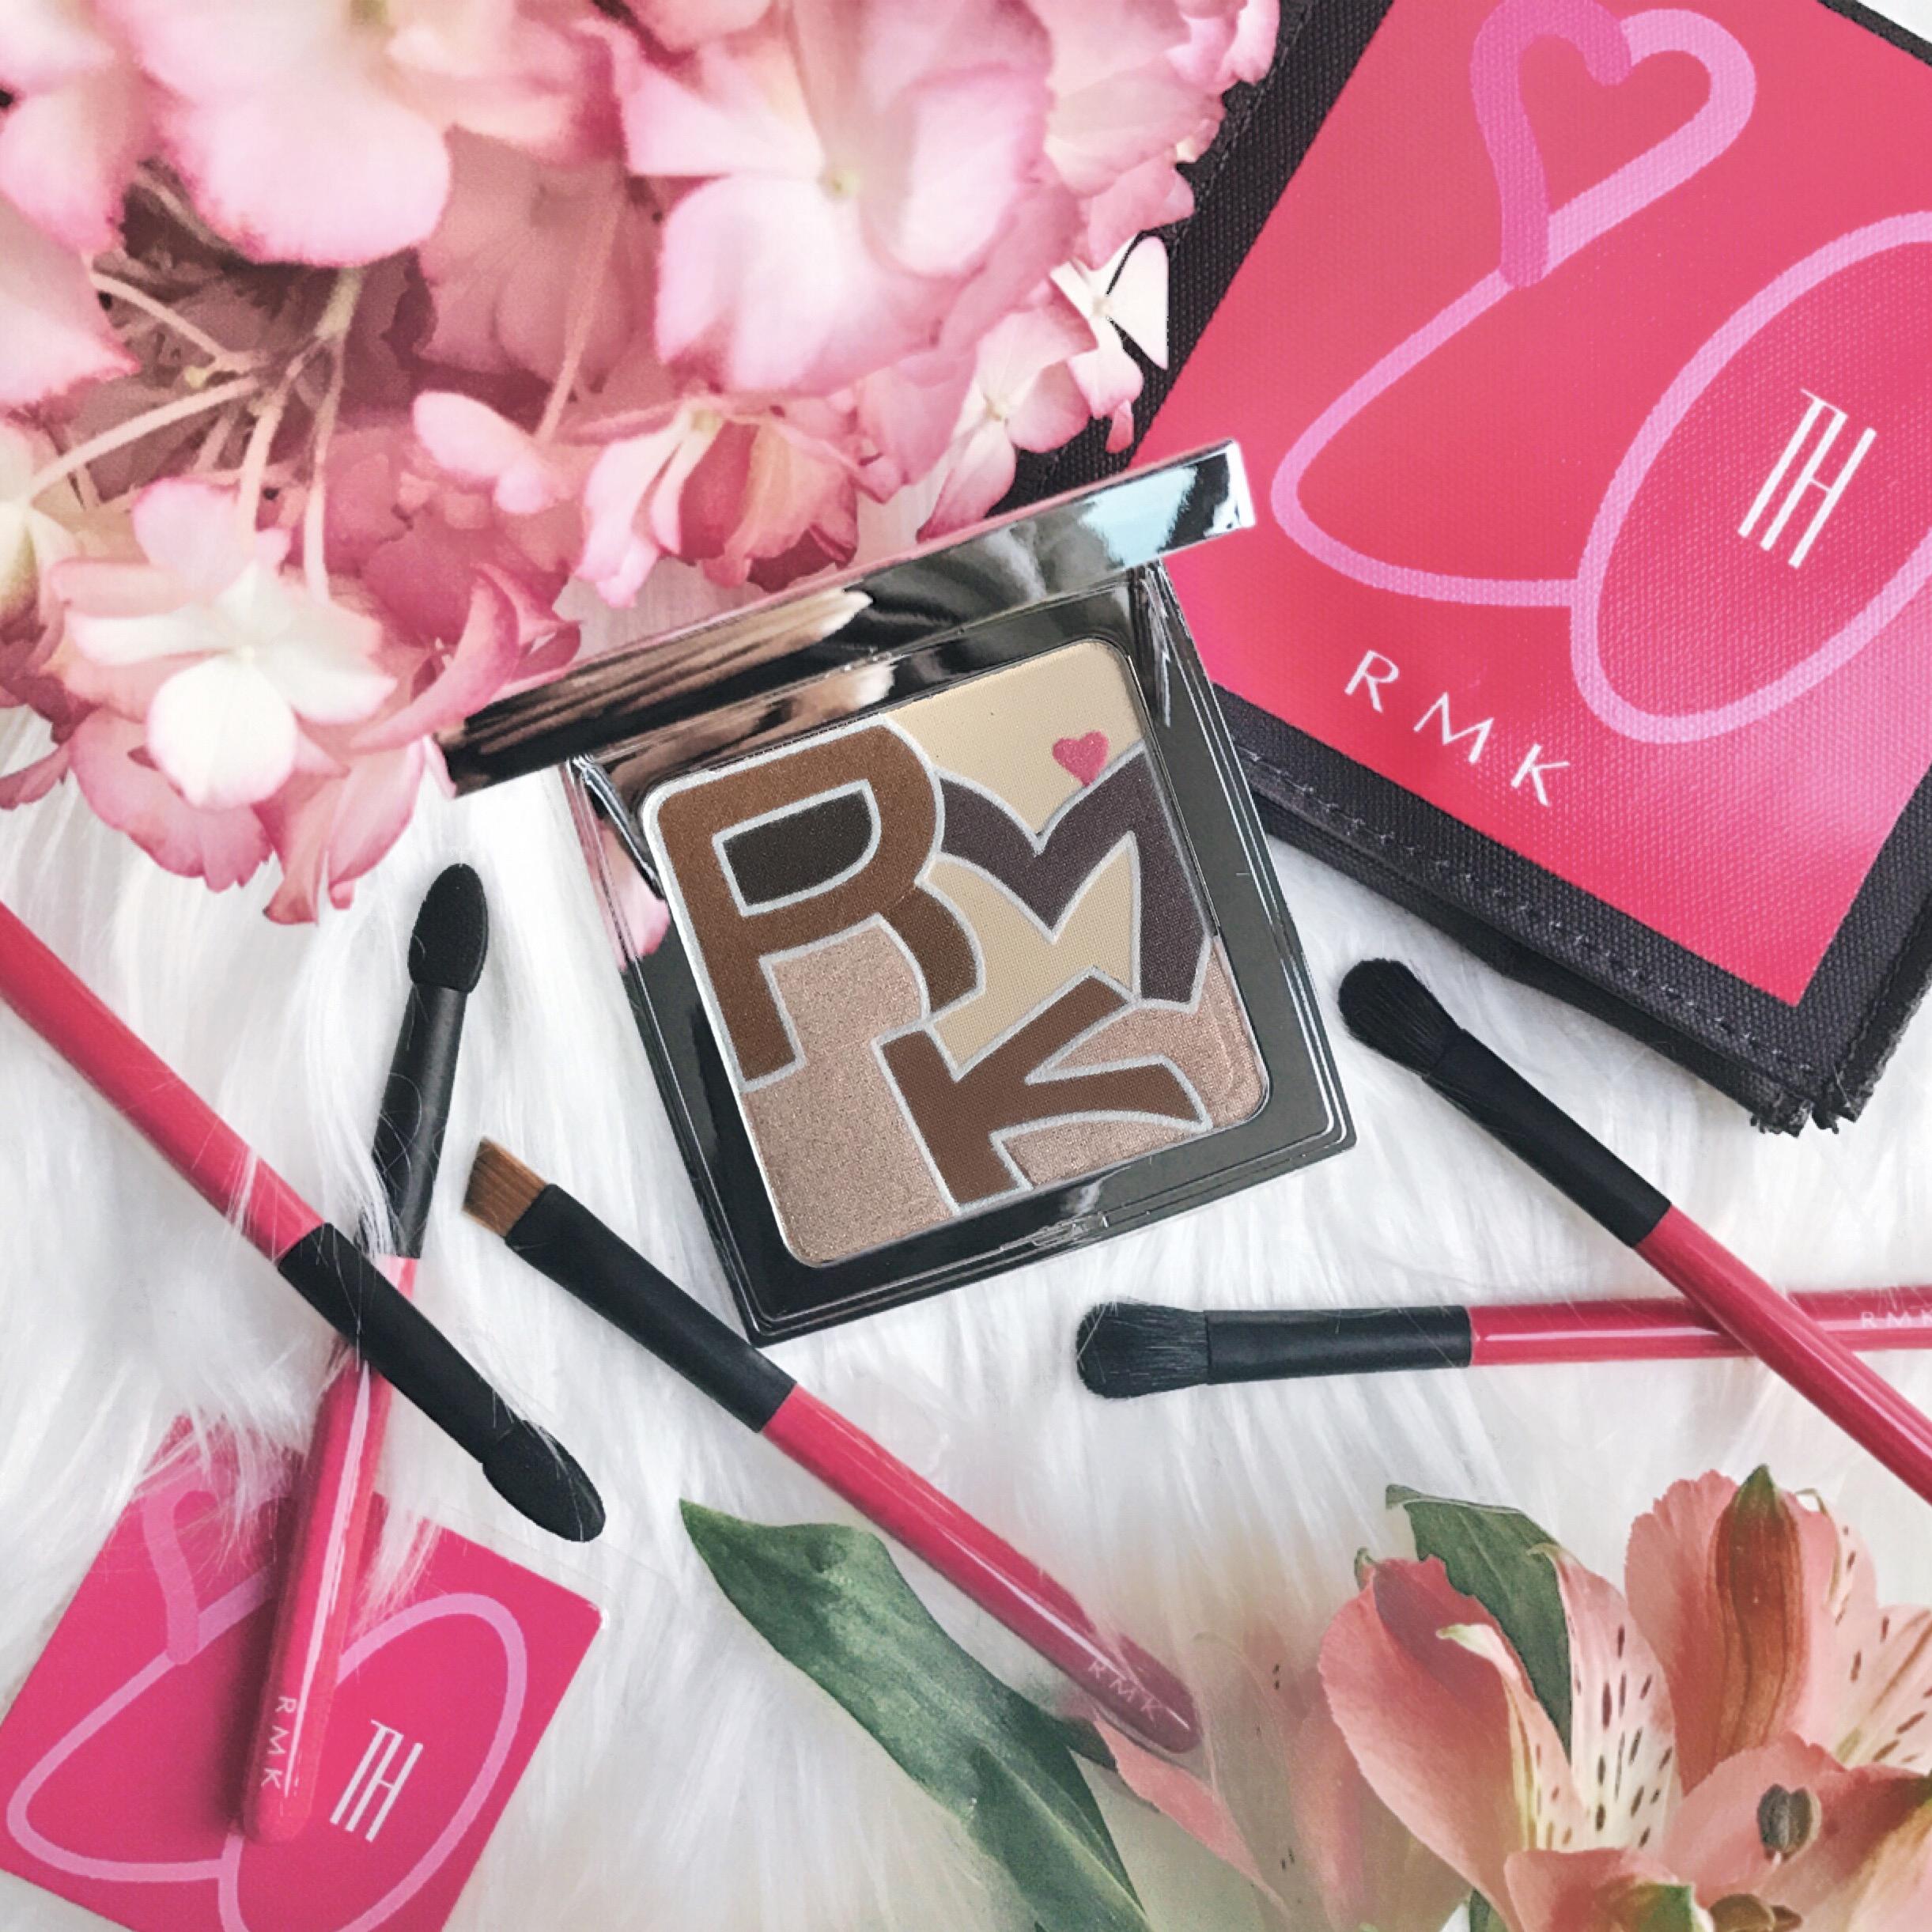 RMK 20th Anniversary Eyeshadow Palette & Brush Set